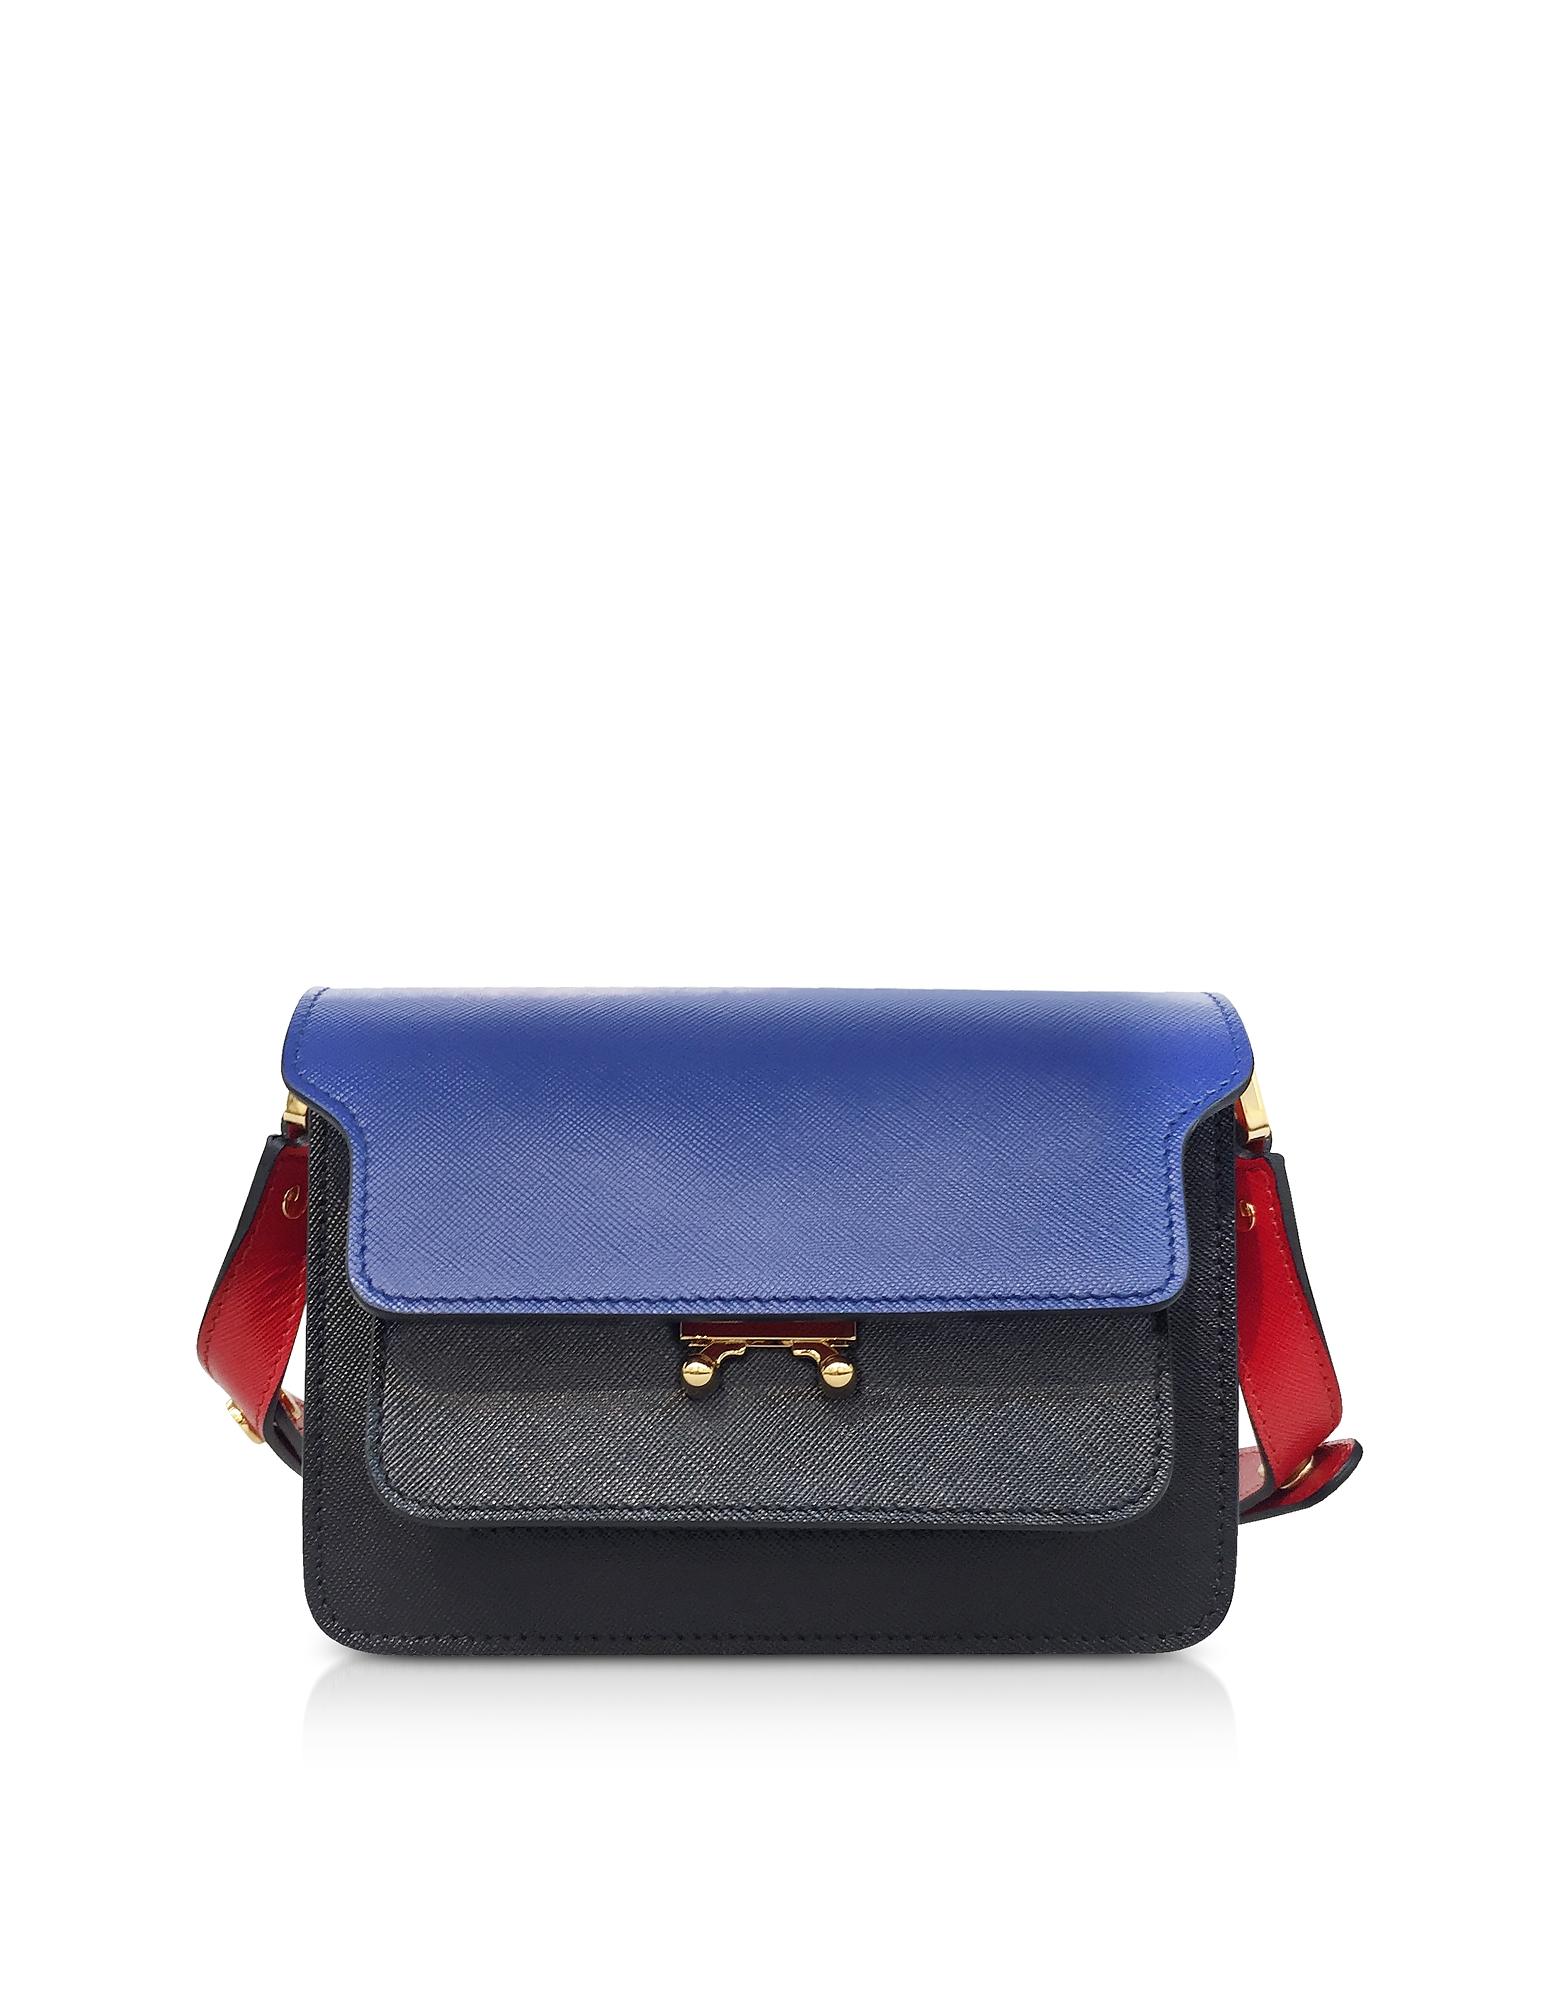 Bluette, Black and Hot Red Leather Trunk Mini Shoulder Bag